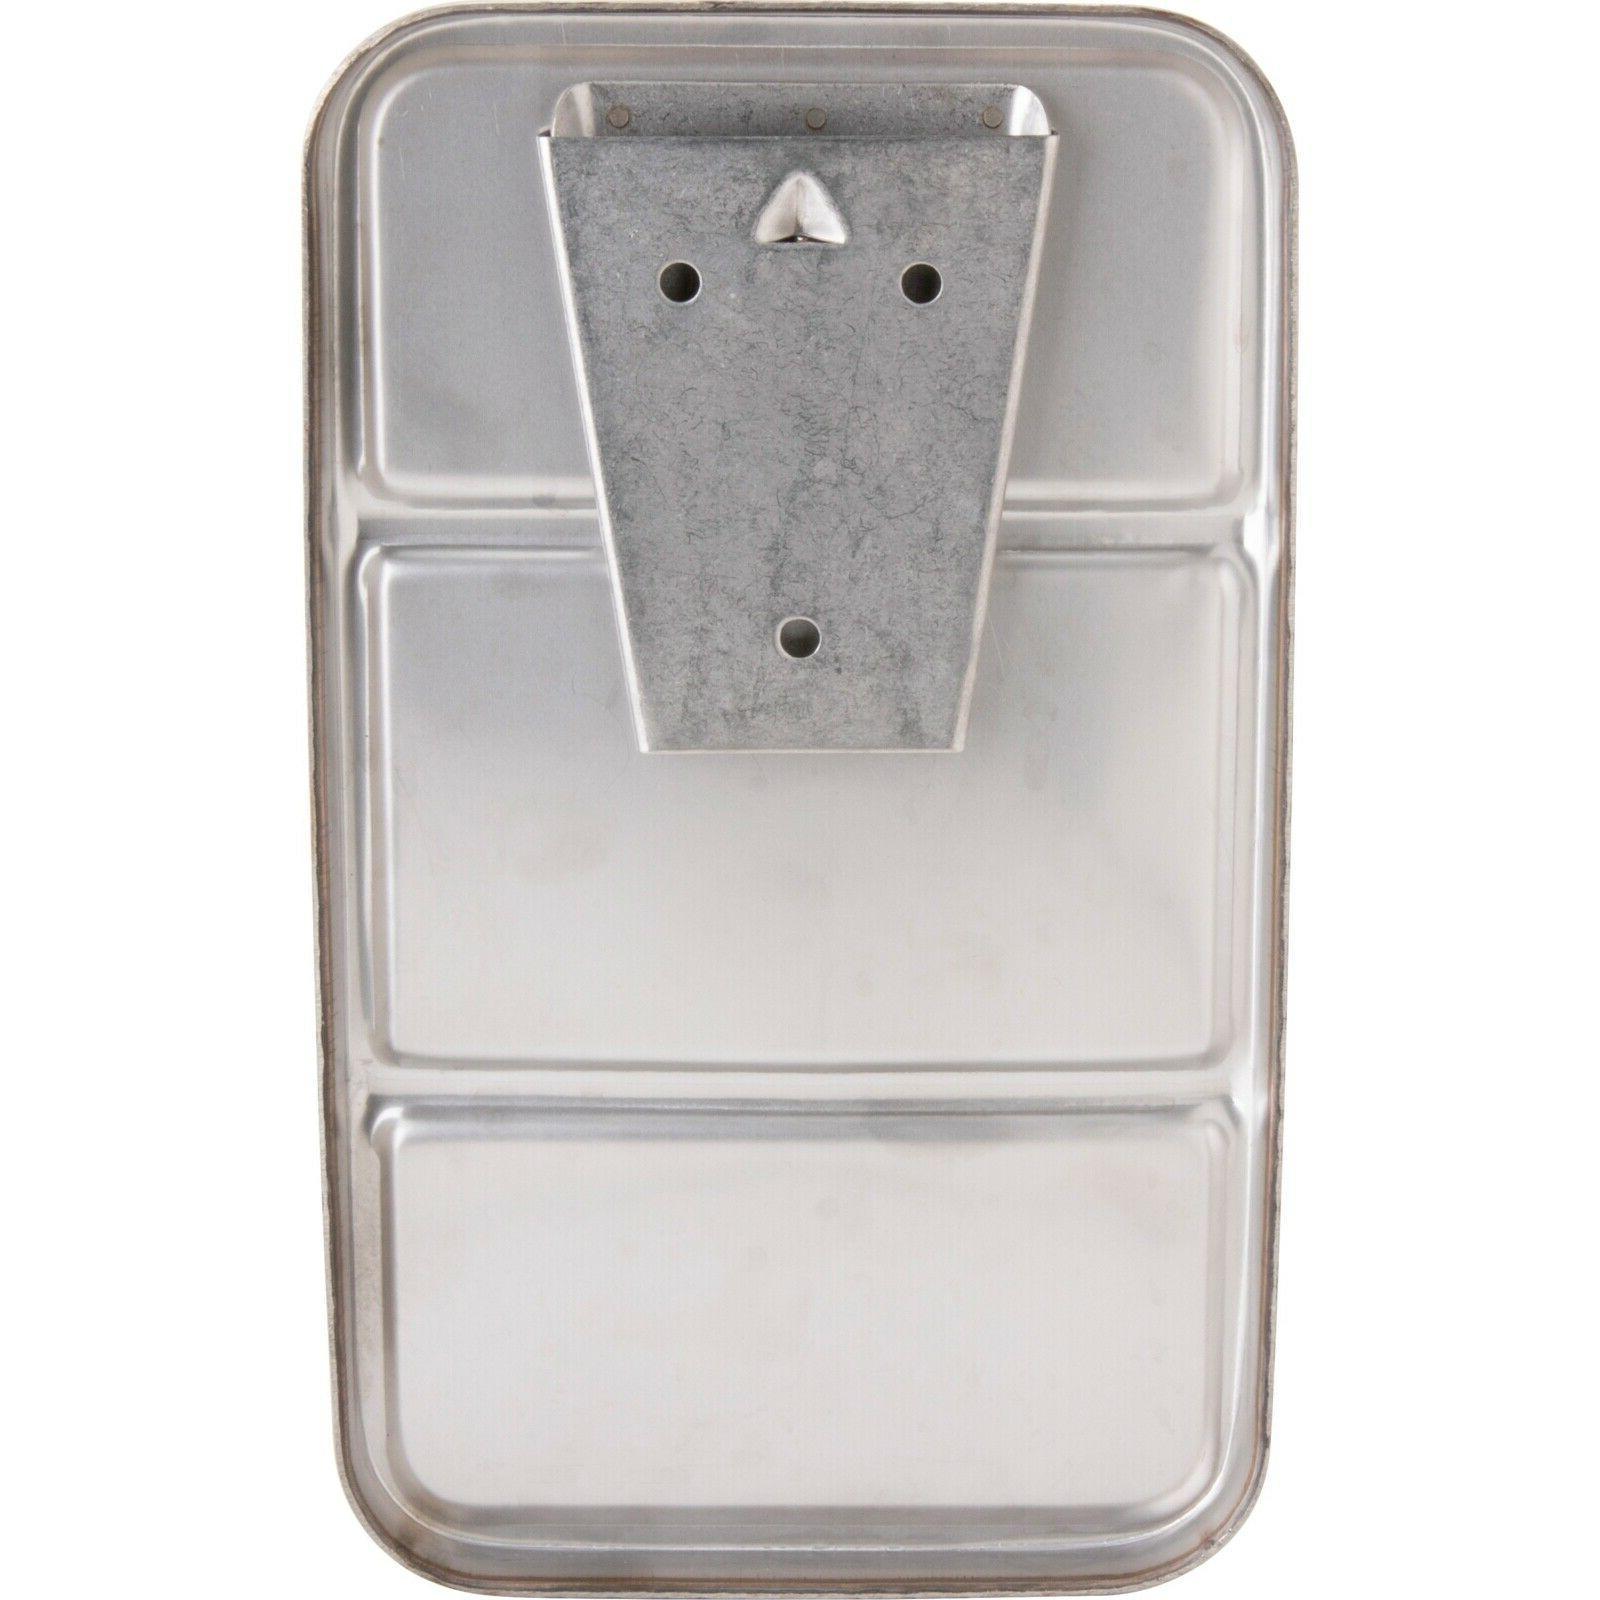 Genuine Steel Soap Manual